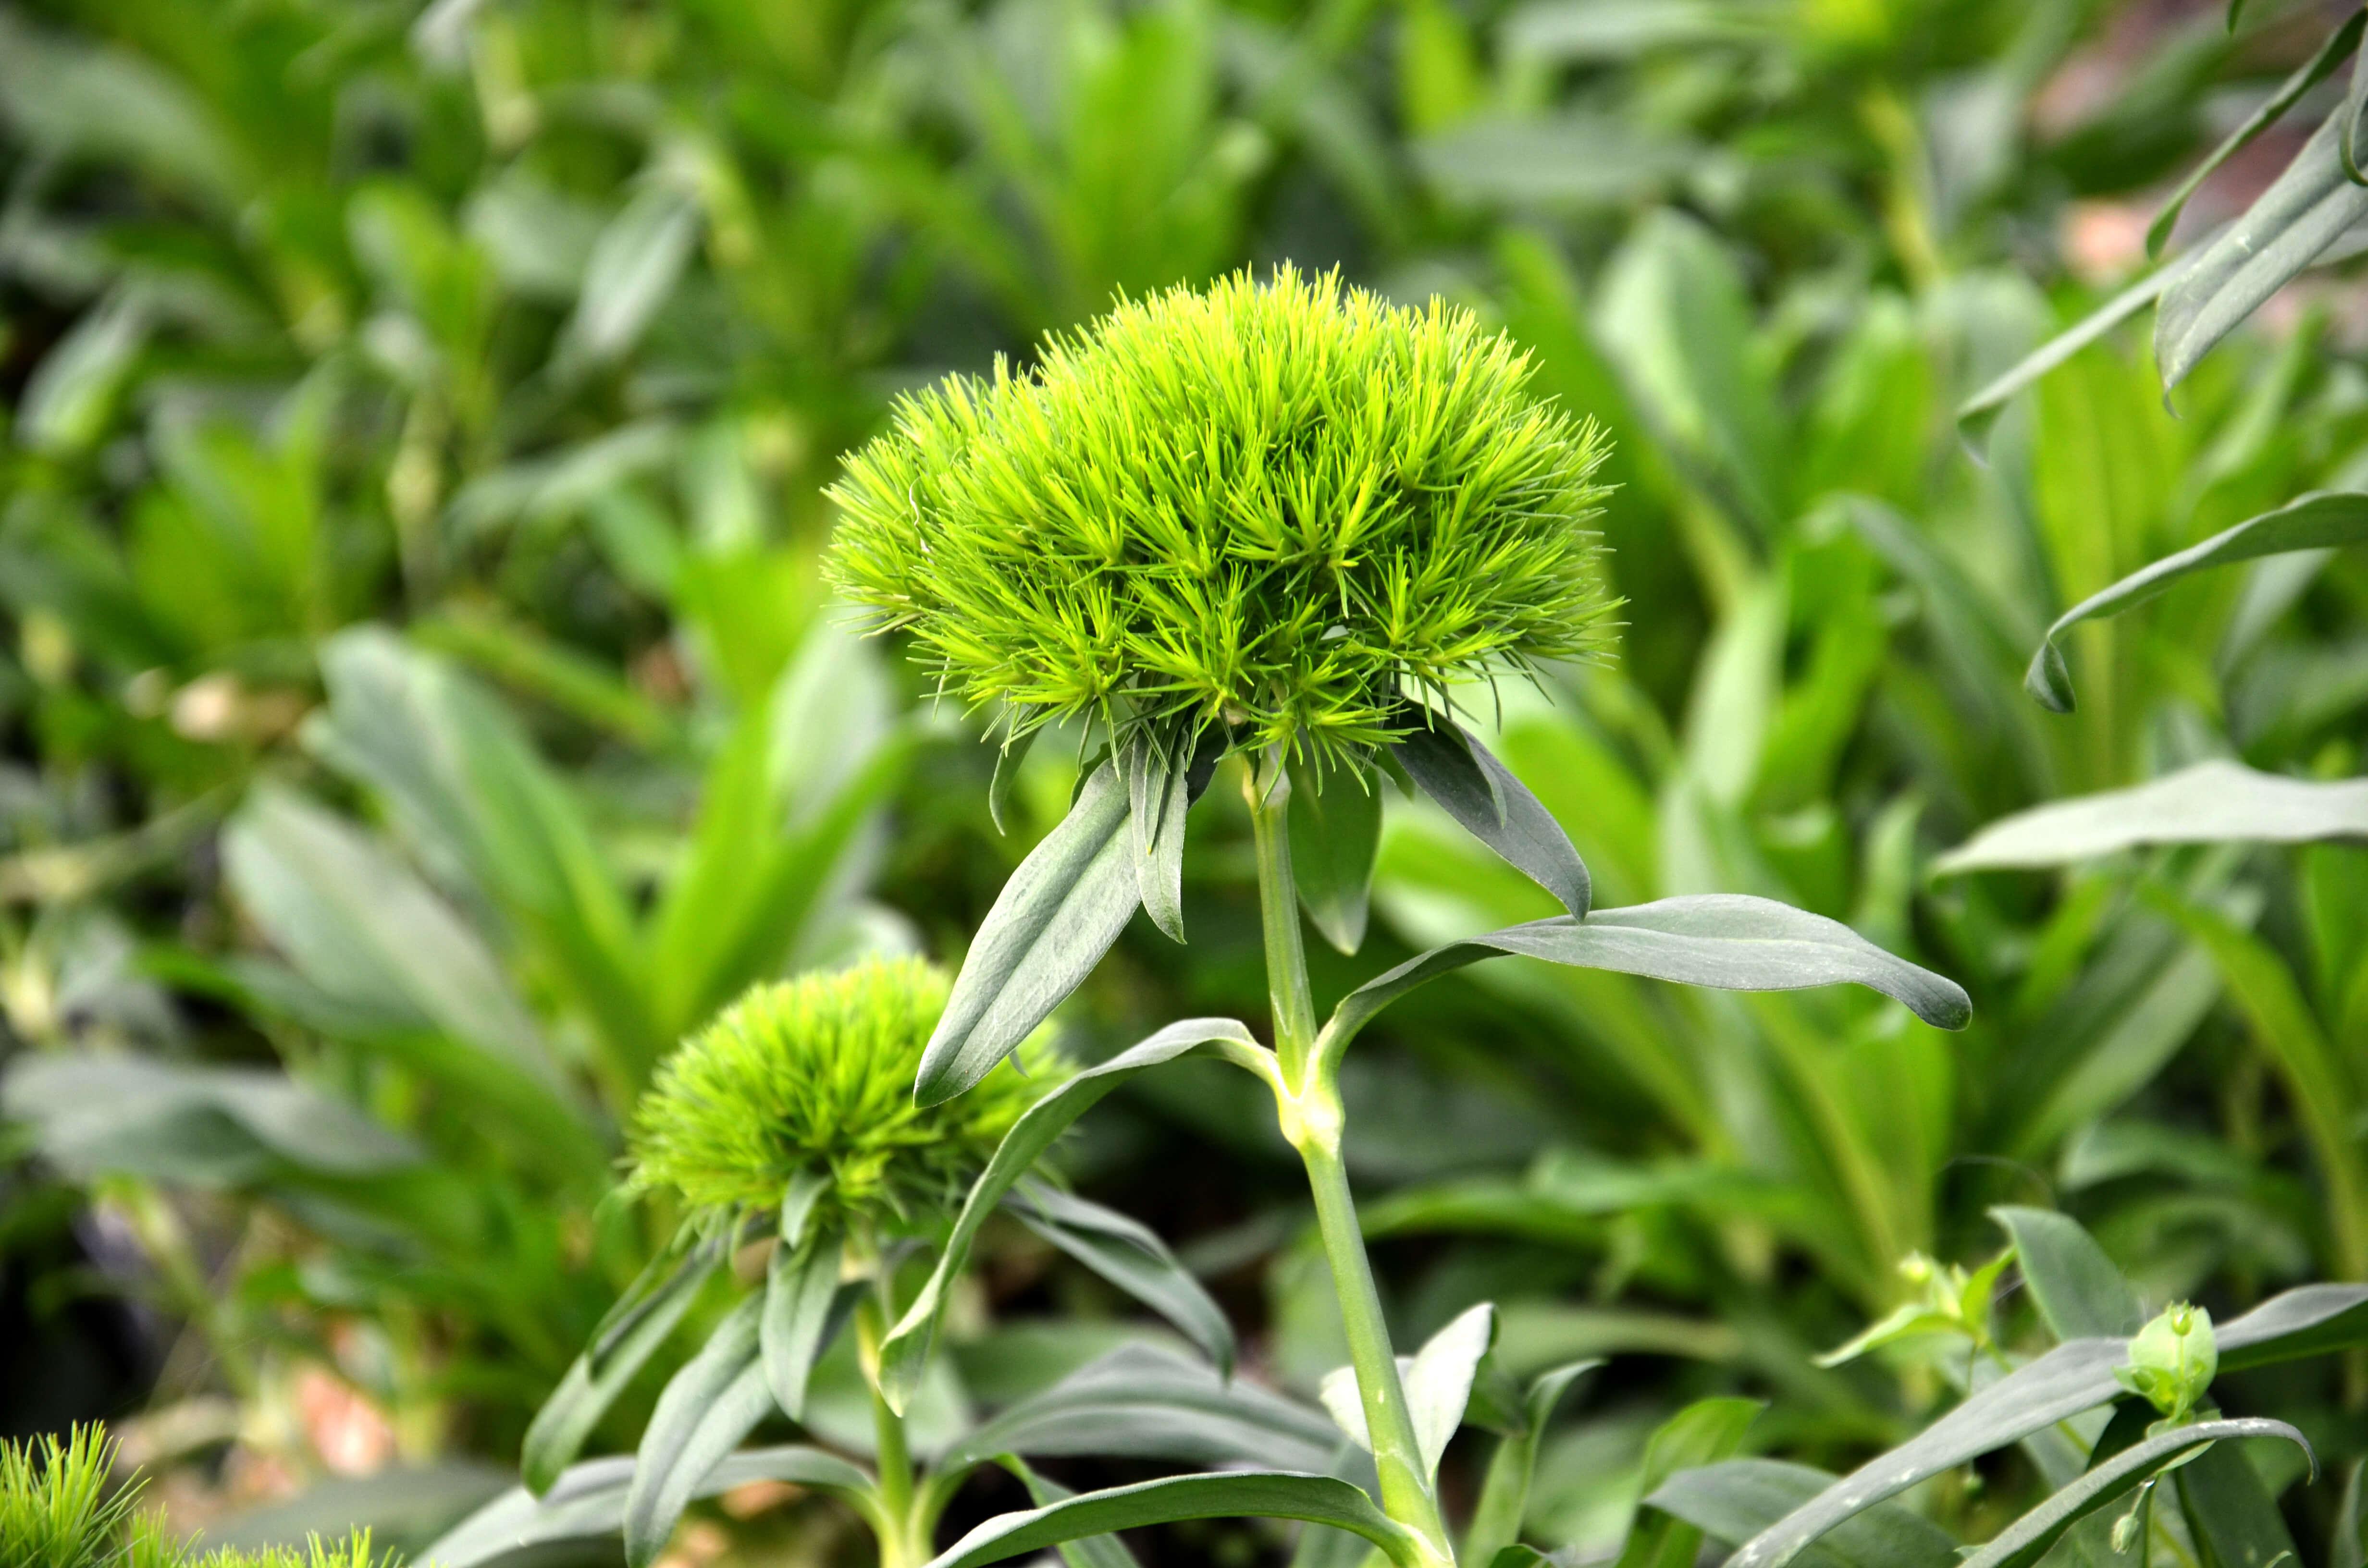 Clavell verd